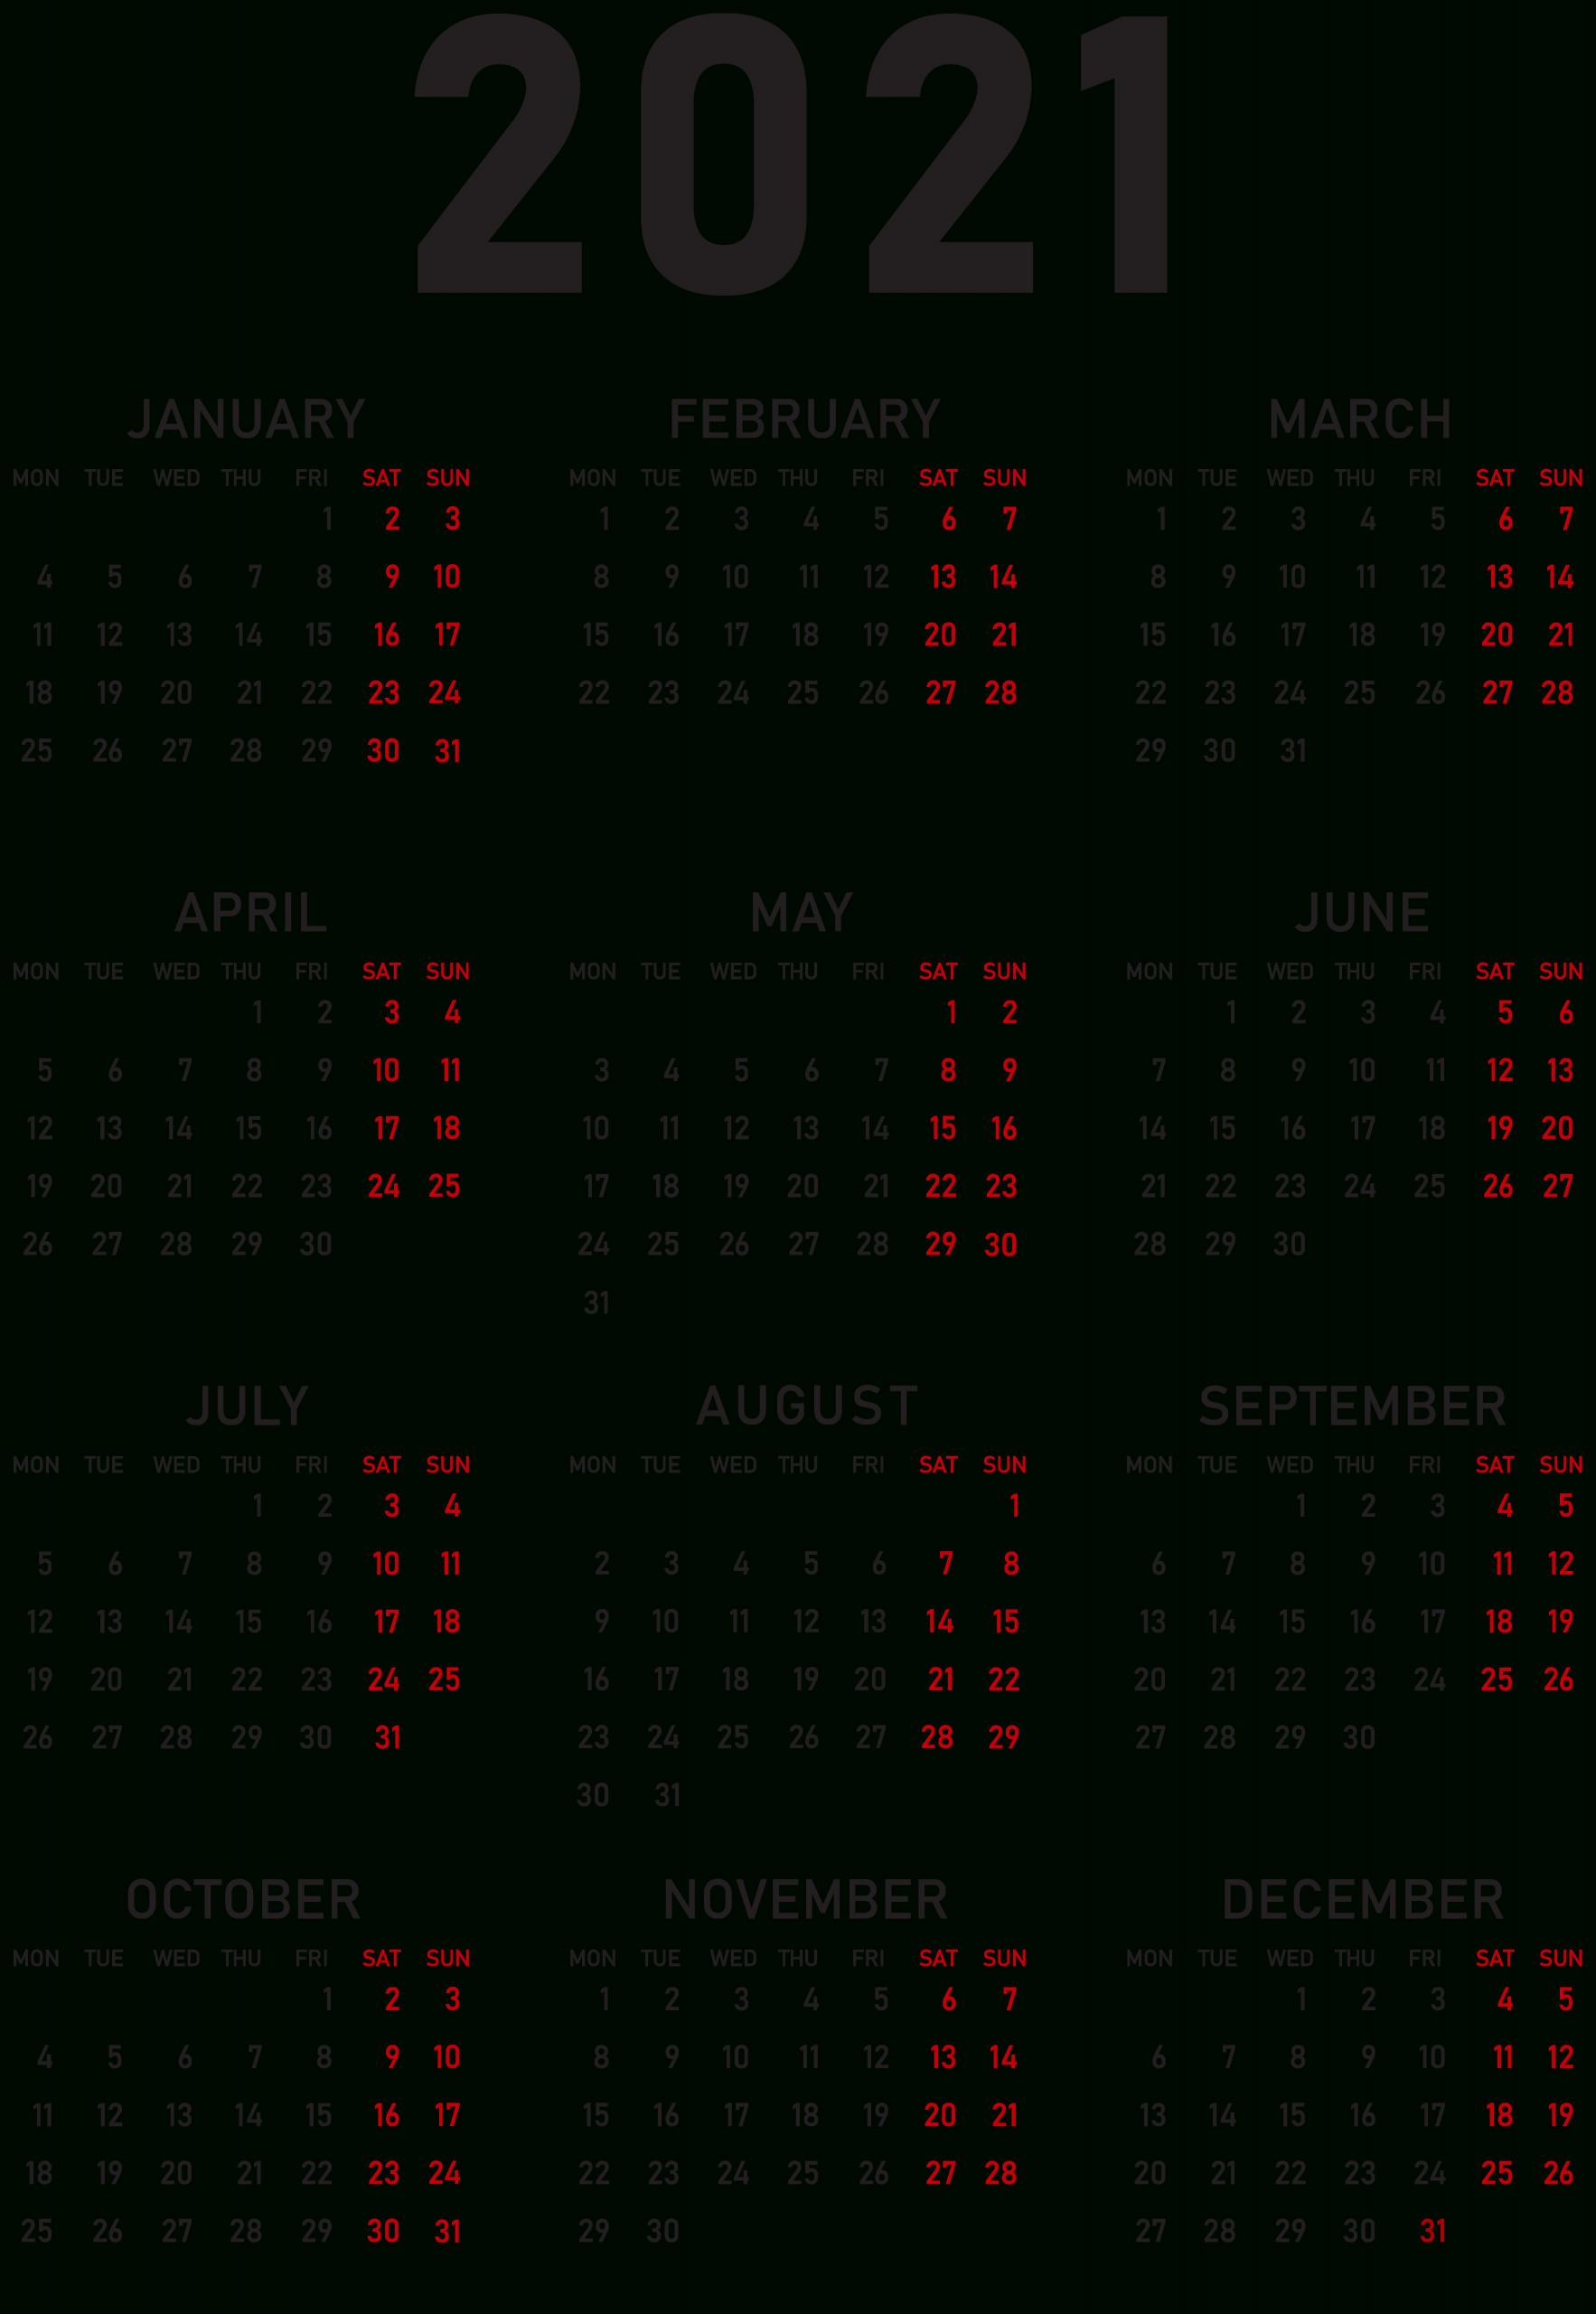 2021 Calendars Wallpapers Wallpaper Cave